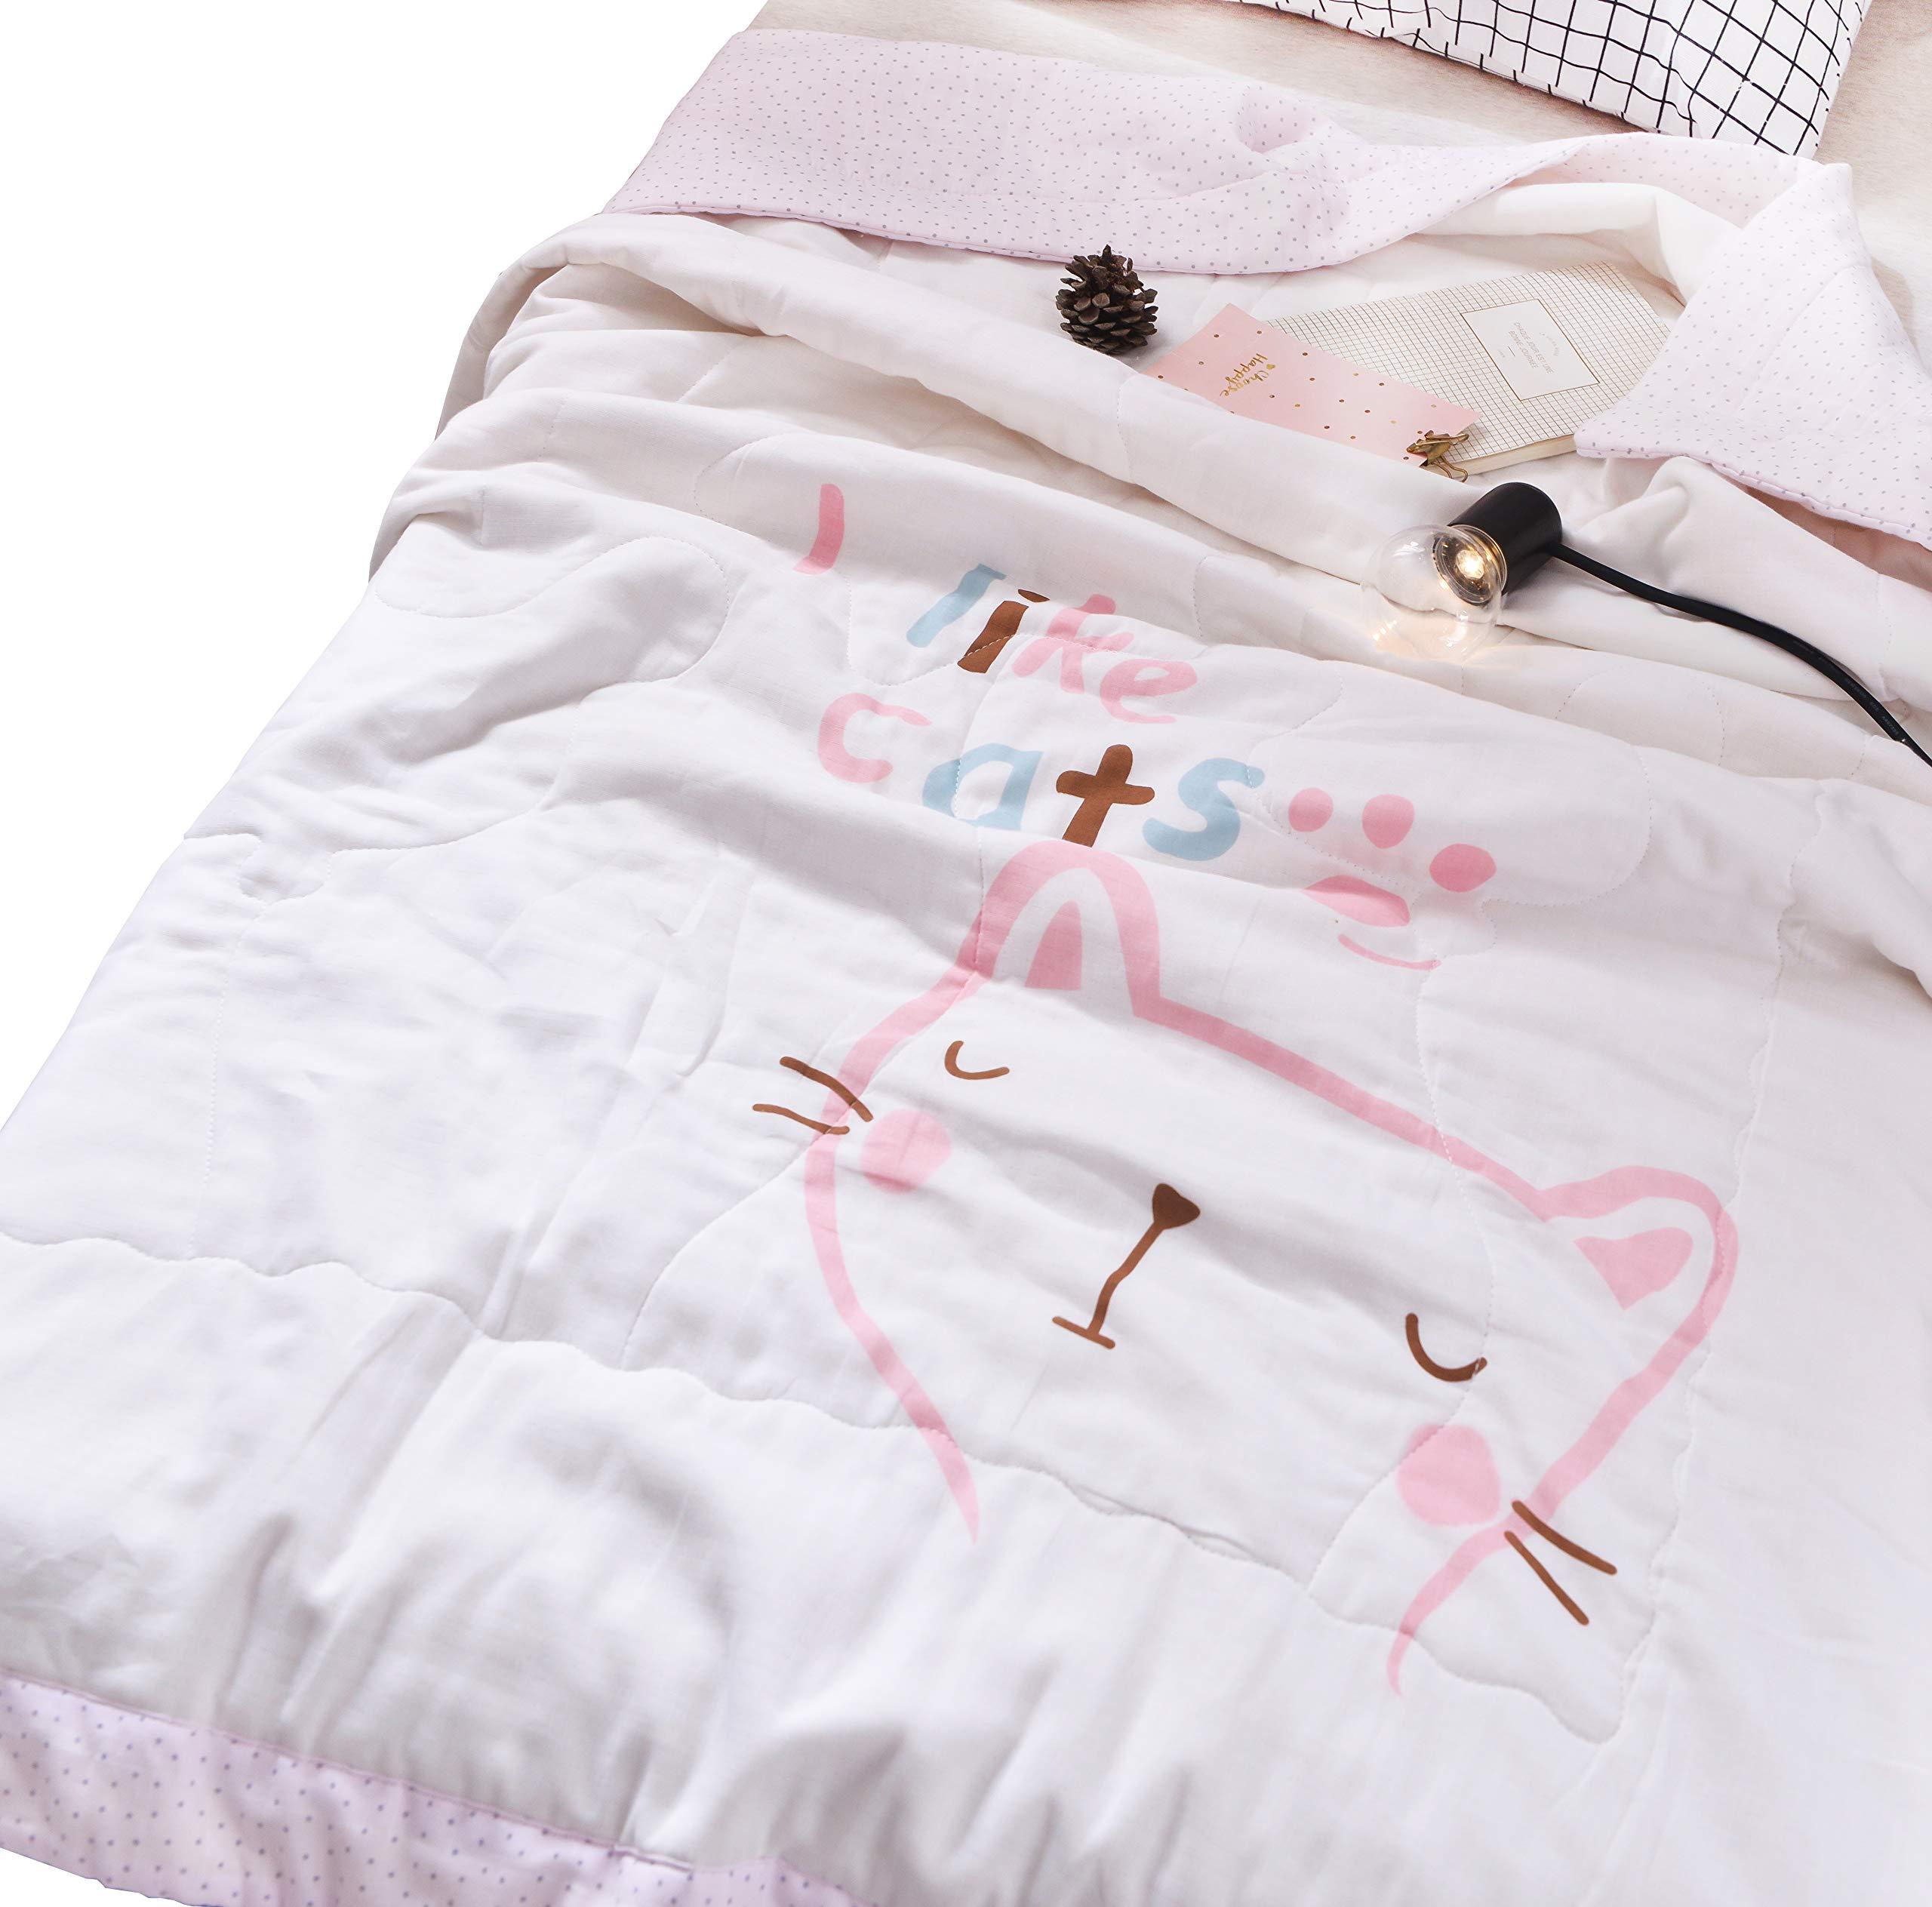 Scientific Sleep Kids Cute Kitty Cats Cartoon Muslin Quilt Comforter Thin Bed Coverlet Blanket for Toddler Boys & Girls Crib Bedding Gift, 47' X 59'' (5)